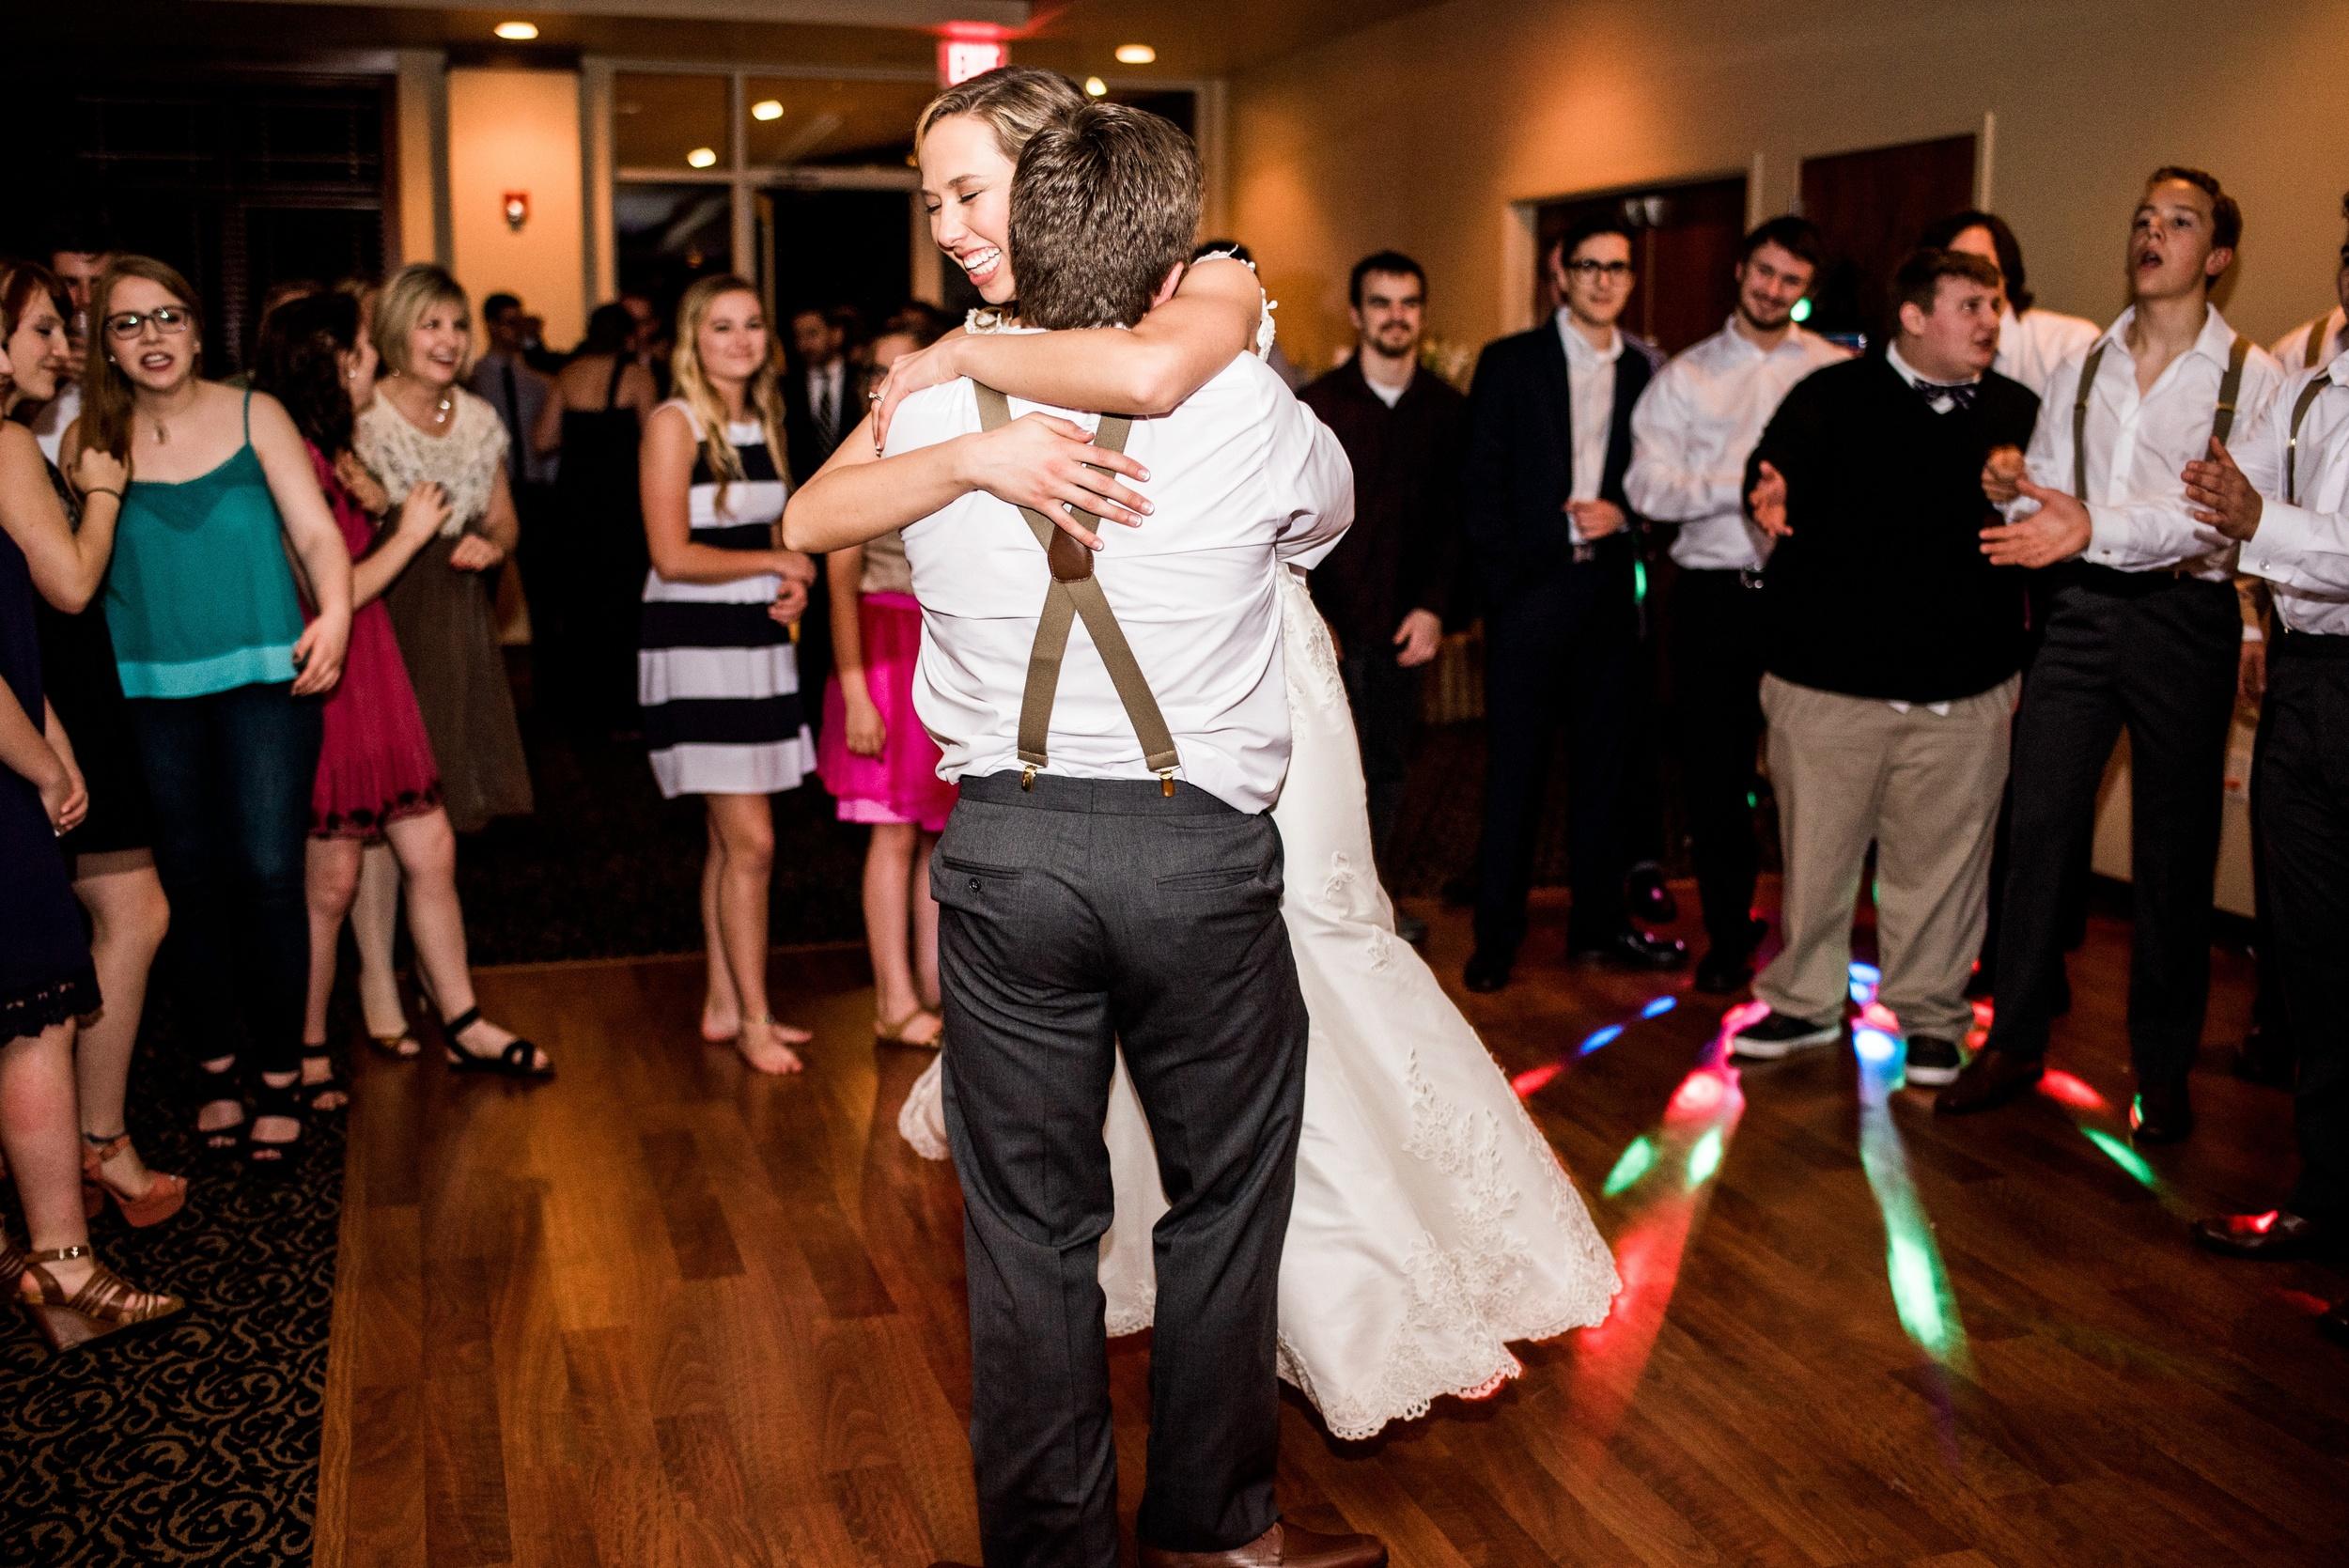 Pleasant Hill Des Moines Wedding Photographer_2197.jpg